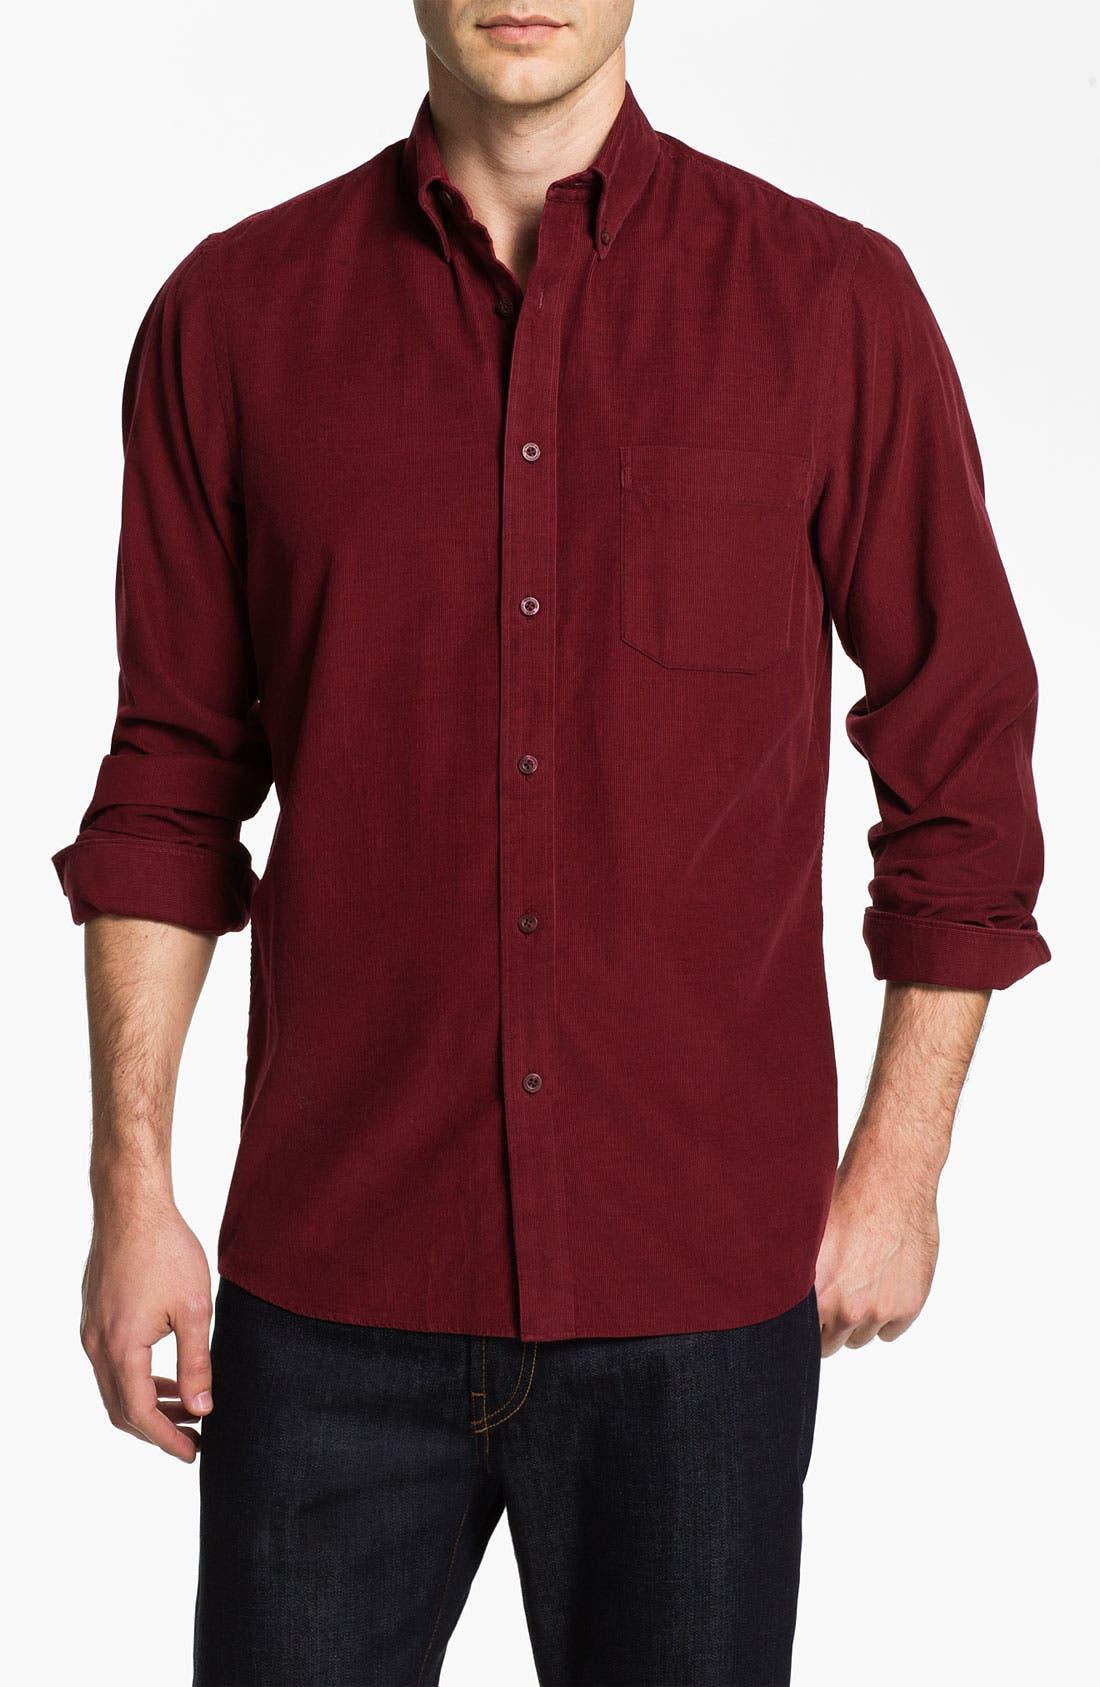 Alternate Image 1 Selected - Nordstrom Regular Fit Corduroy Sport Shirt